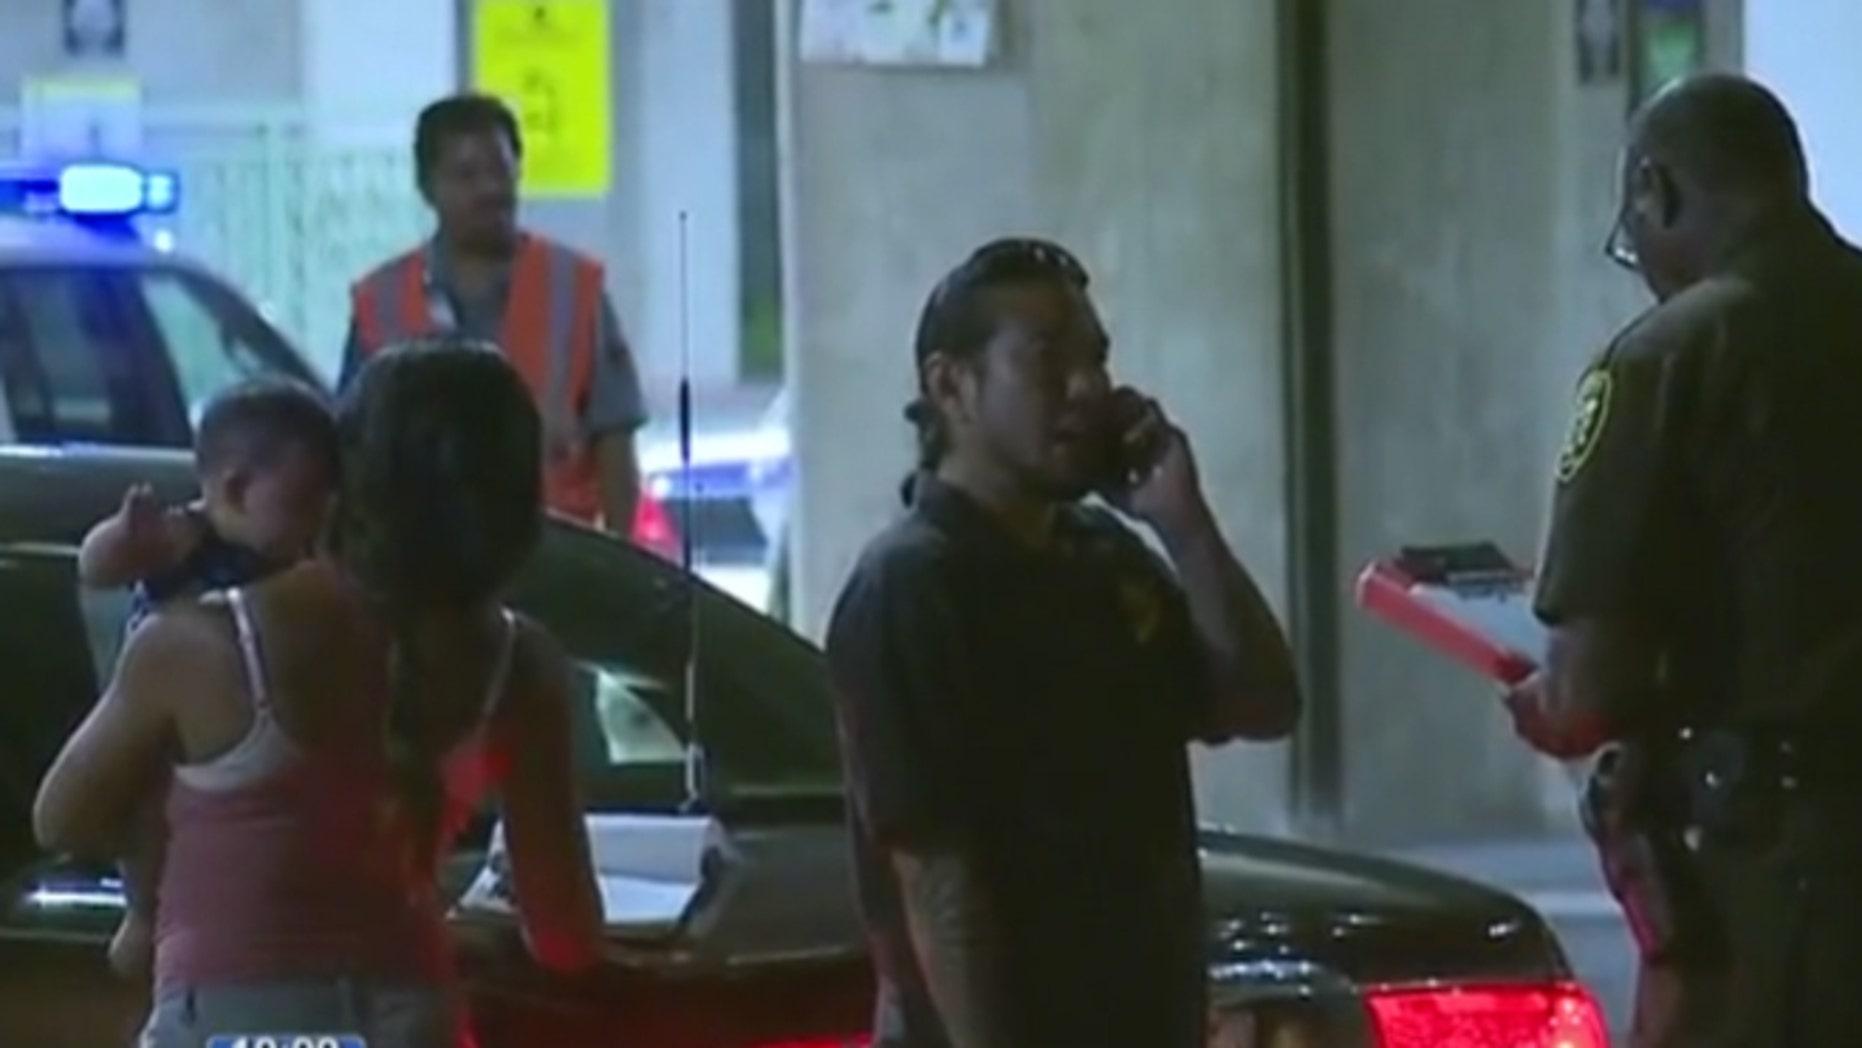 A deputy interviewed Leisha Ramos and her boyfriend Jadd Matsuda after the killing of Ramos' dog at Honolulu airport Tuesday.